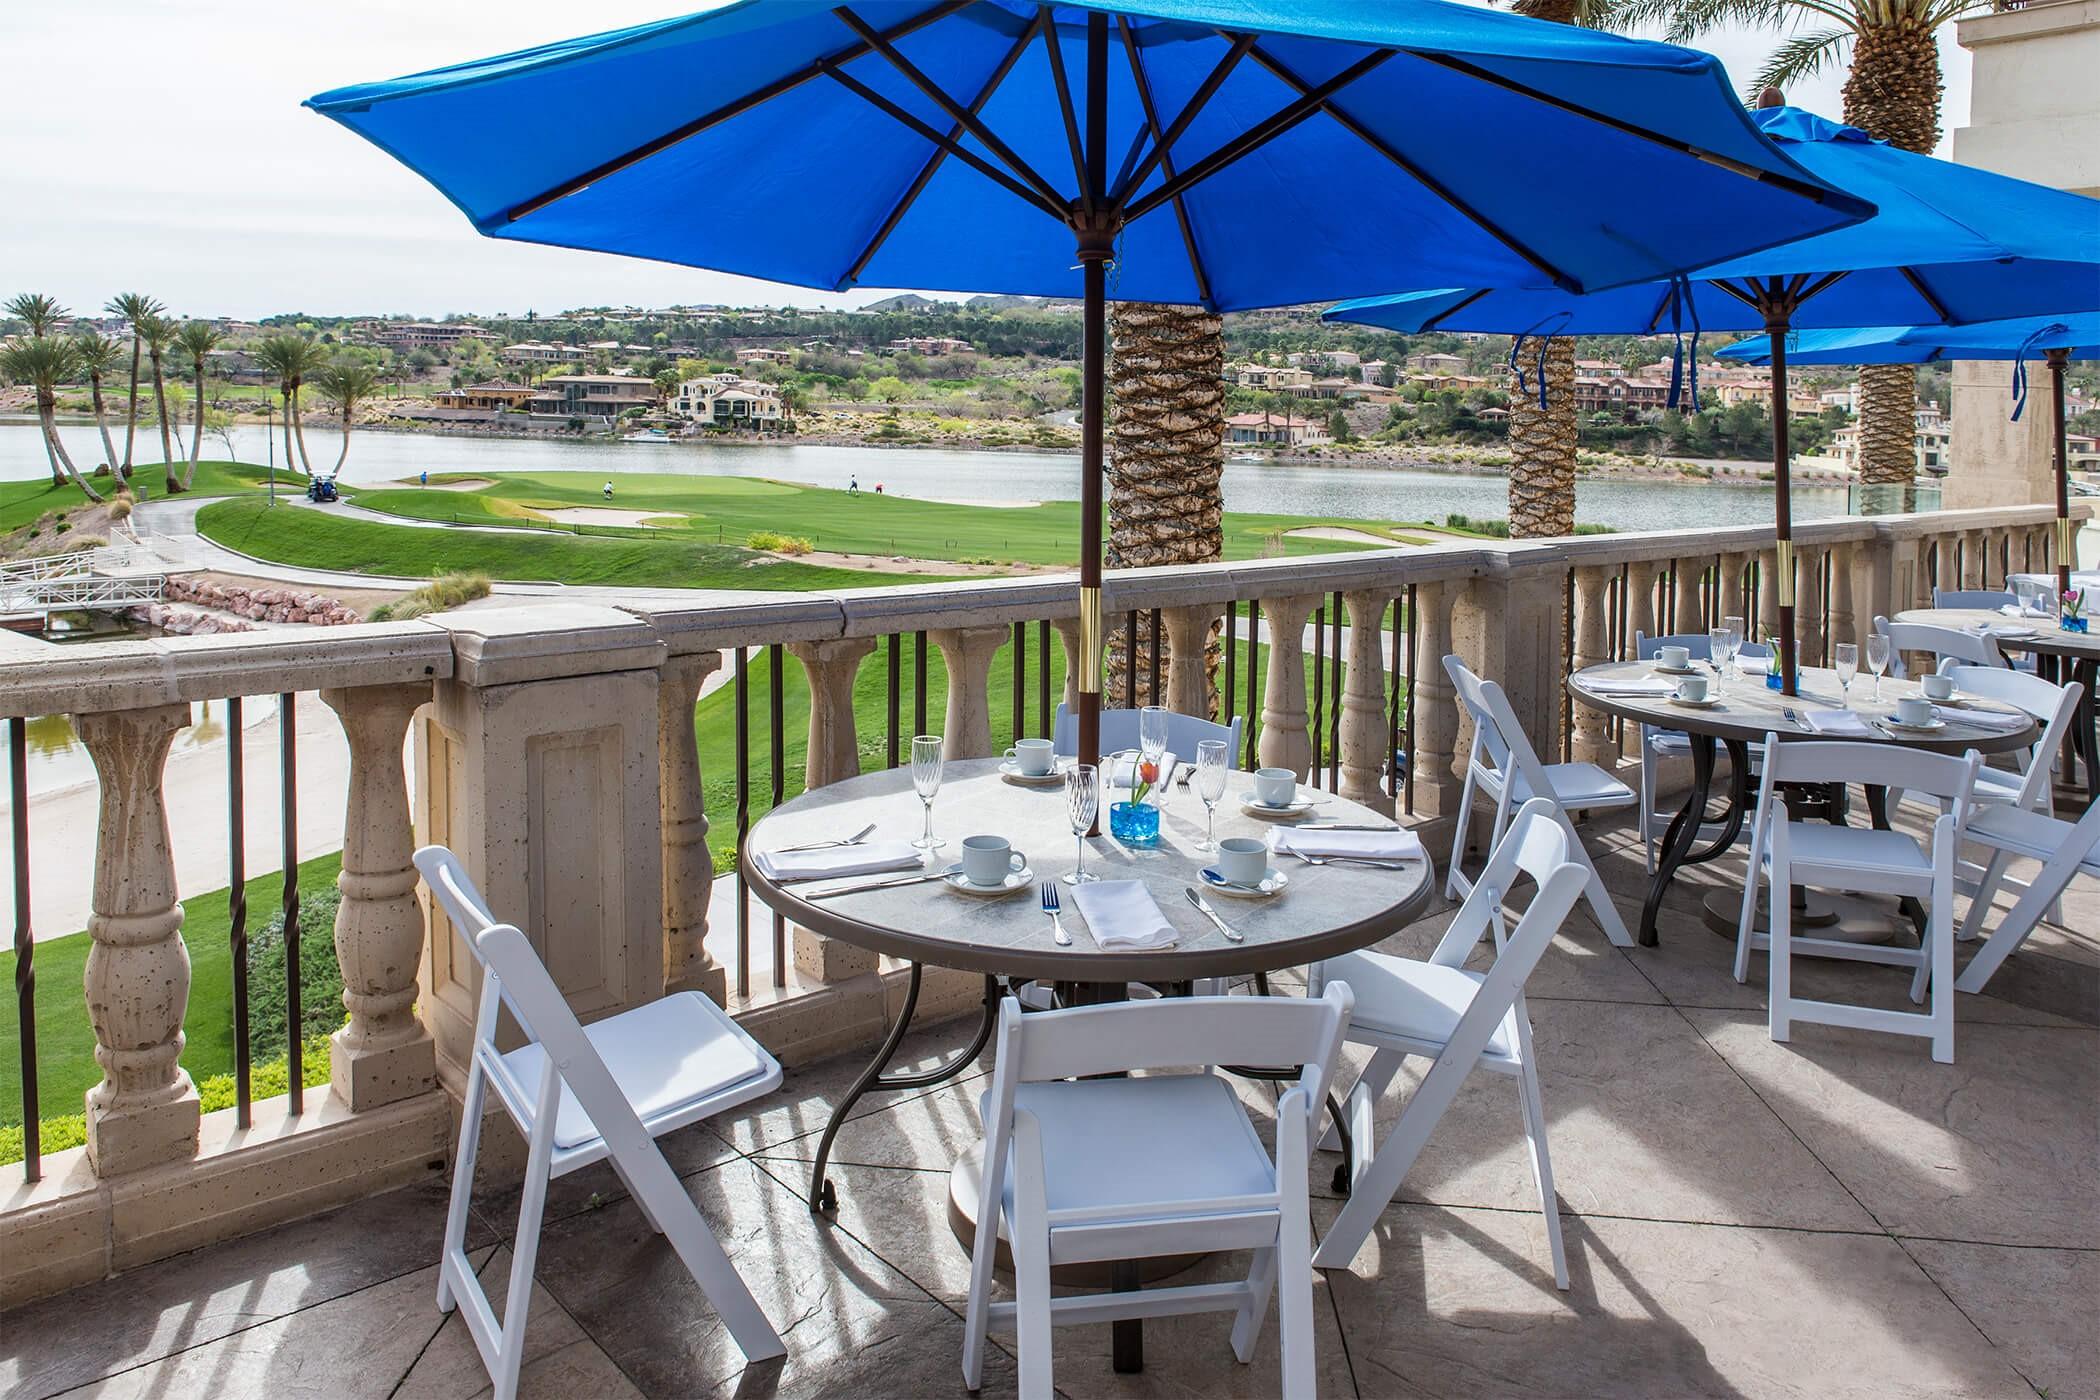 Bayside Grill Las Vegas - Waterfront Las Vegas Restaurant